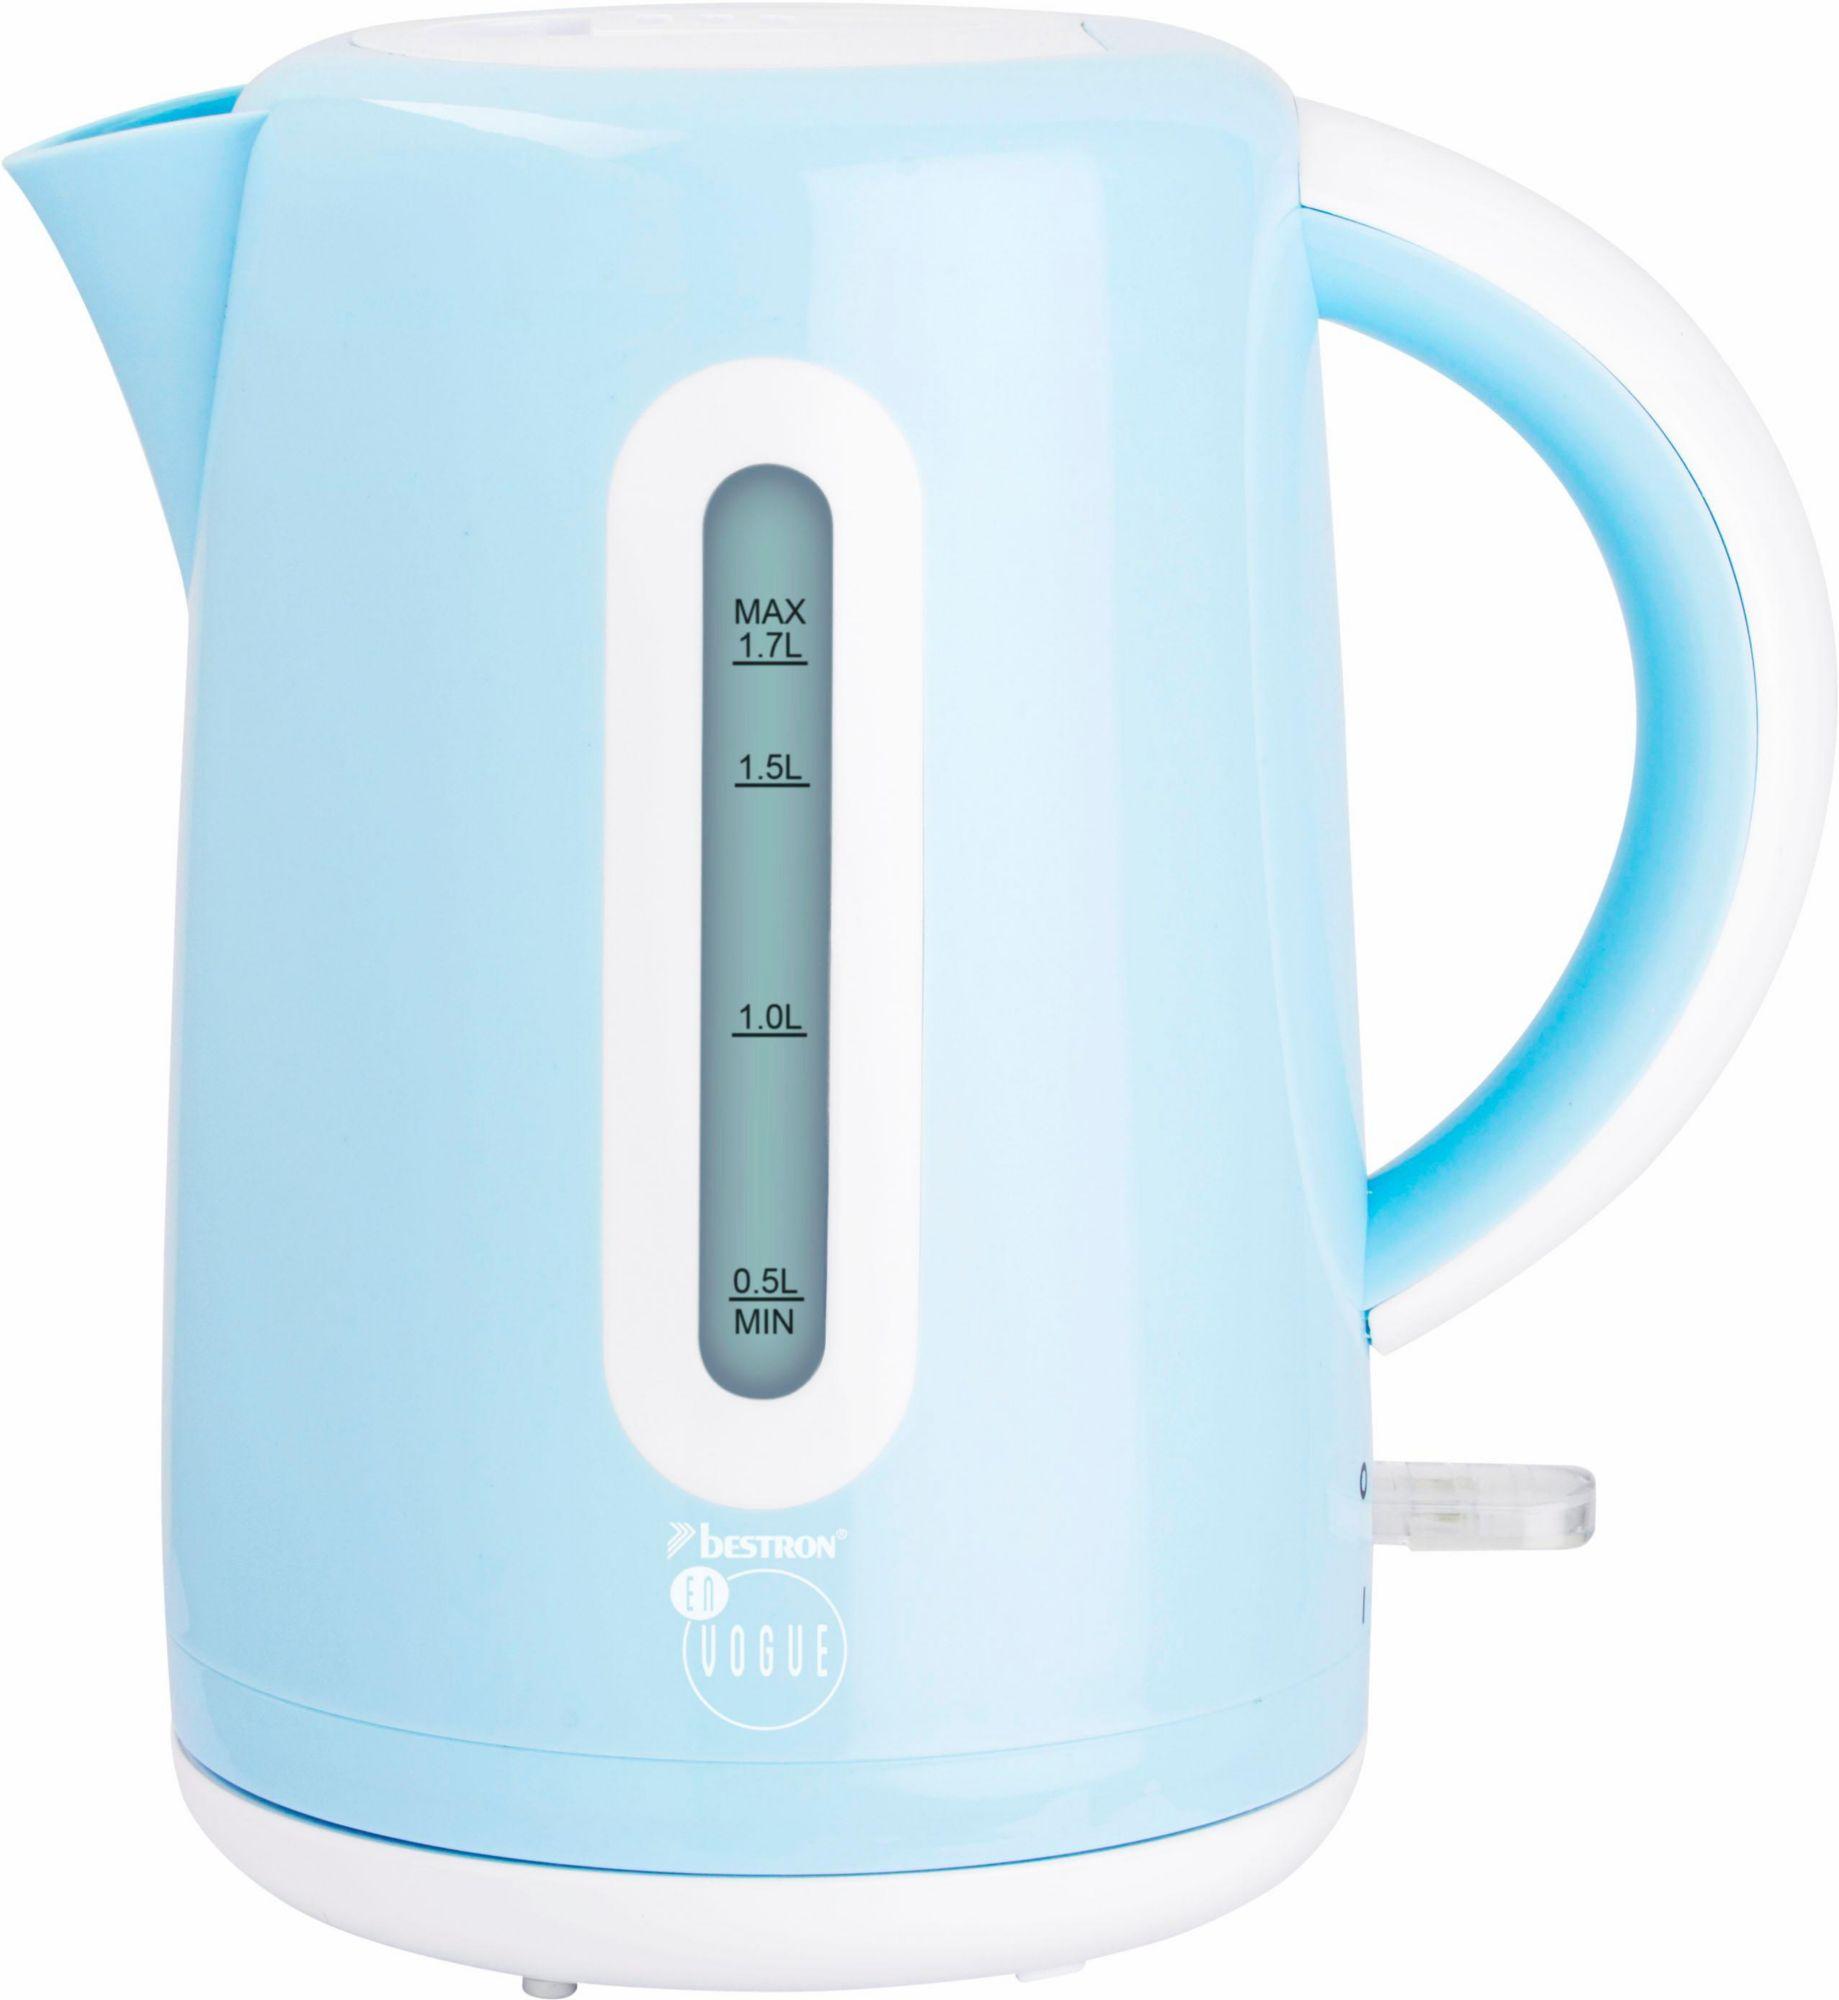 BESTRON Bestron Wasserkocher AWK300EVB, 1,7 Liter, 1850-2200 Watt, blau